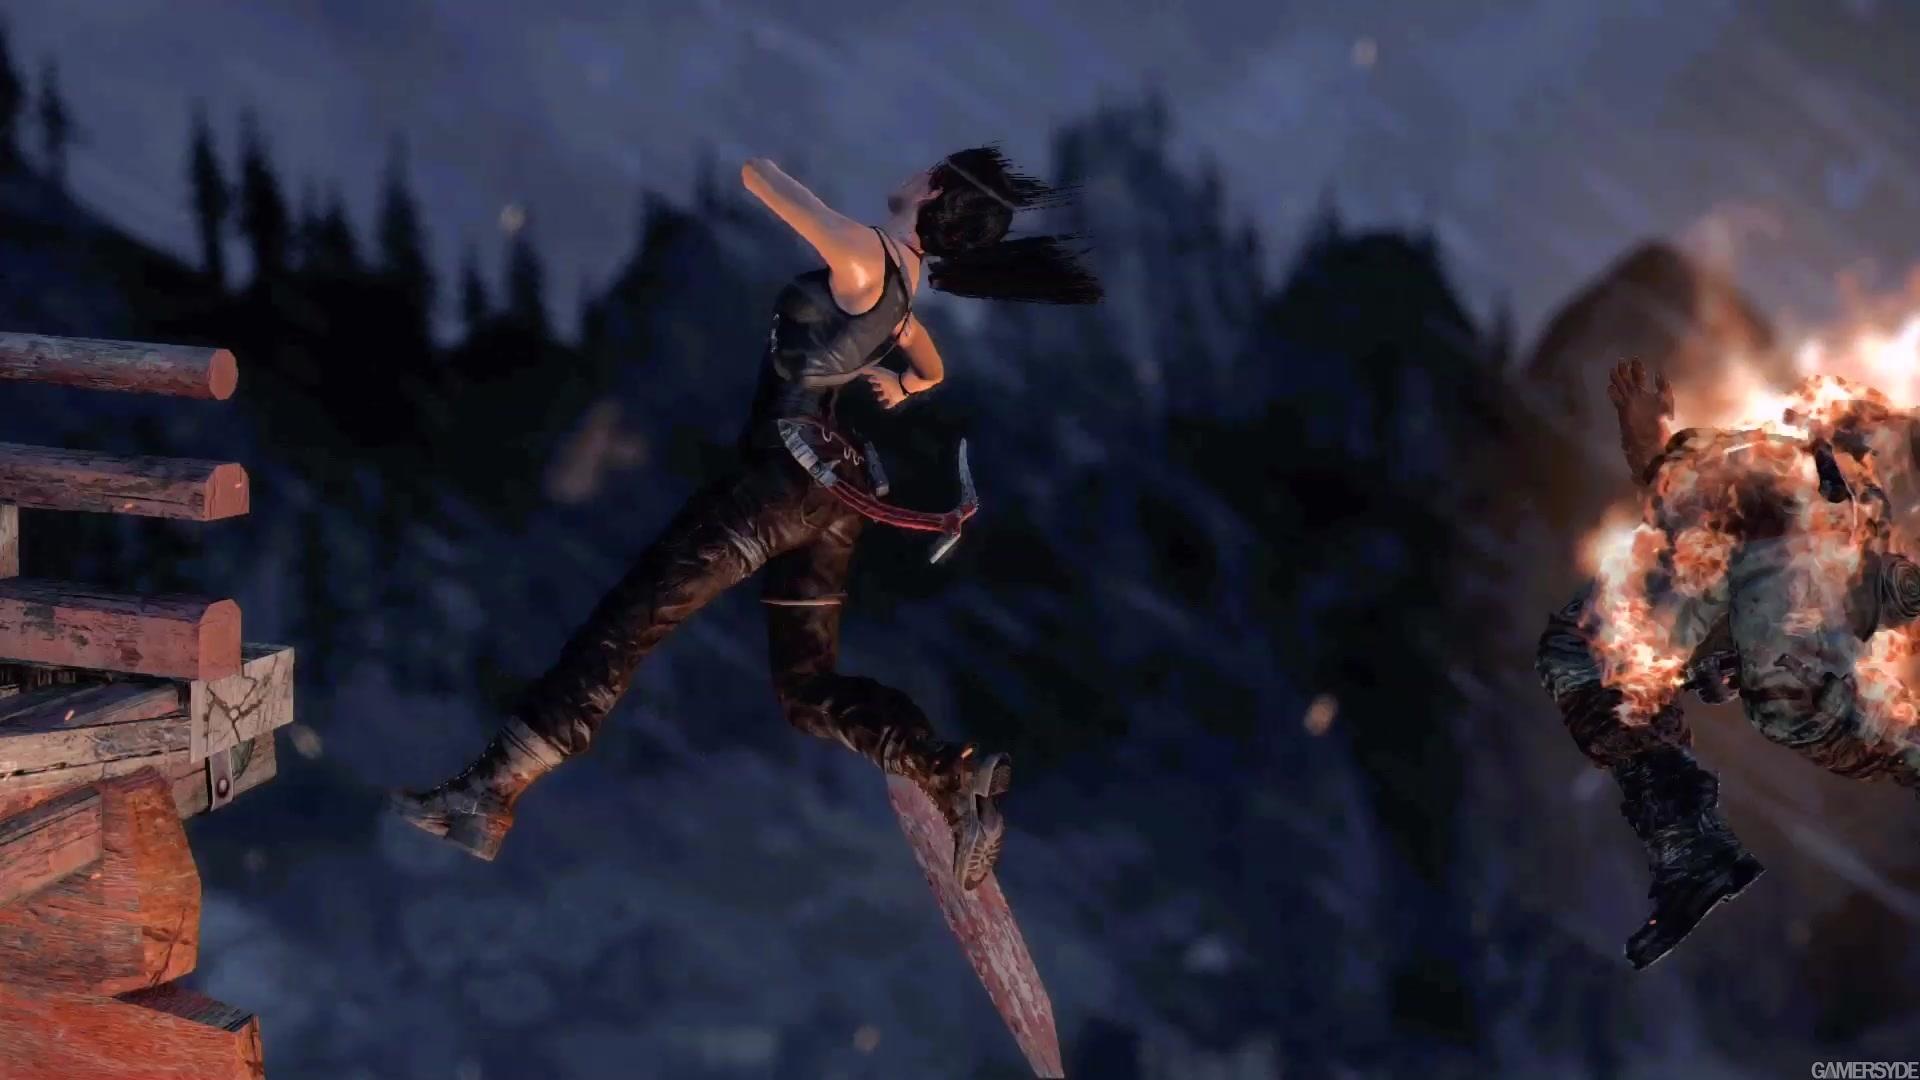 image tomb raider 24052 1912 0019 تصاویر جدیدی از عنوان Tomb Raider: Definitive Edition منتشر شد